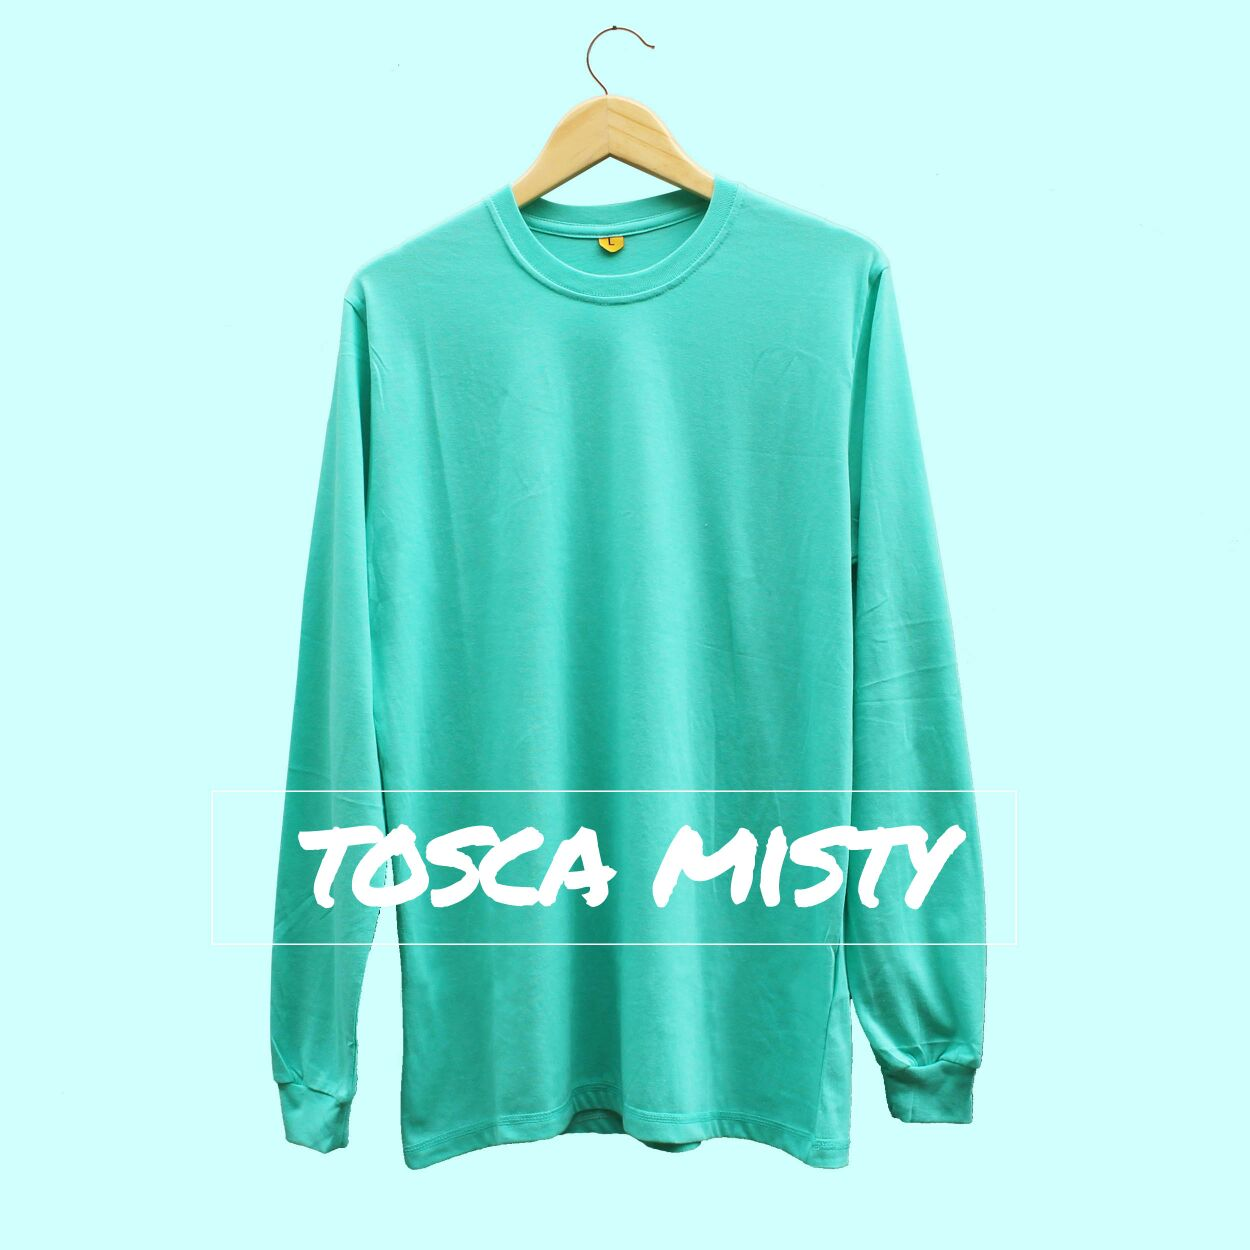 Cotton Cloths Shop Line Kaos Polos Navy Misty Longsleeve Tosca